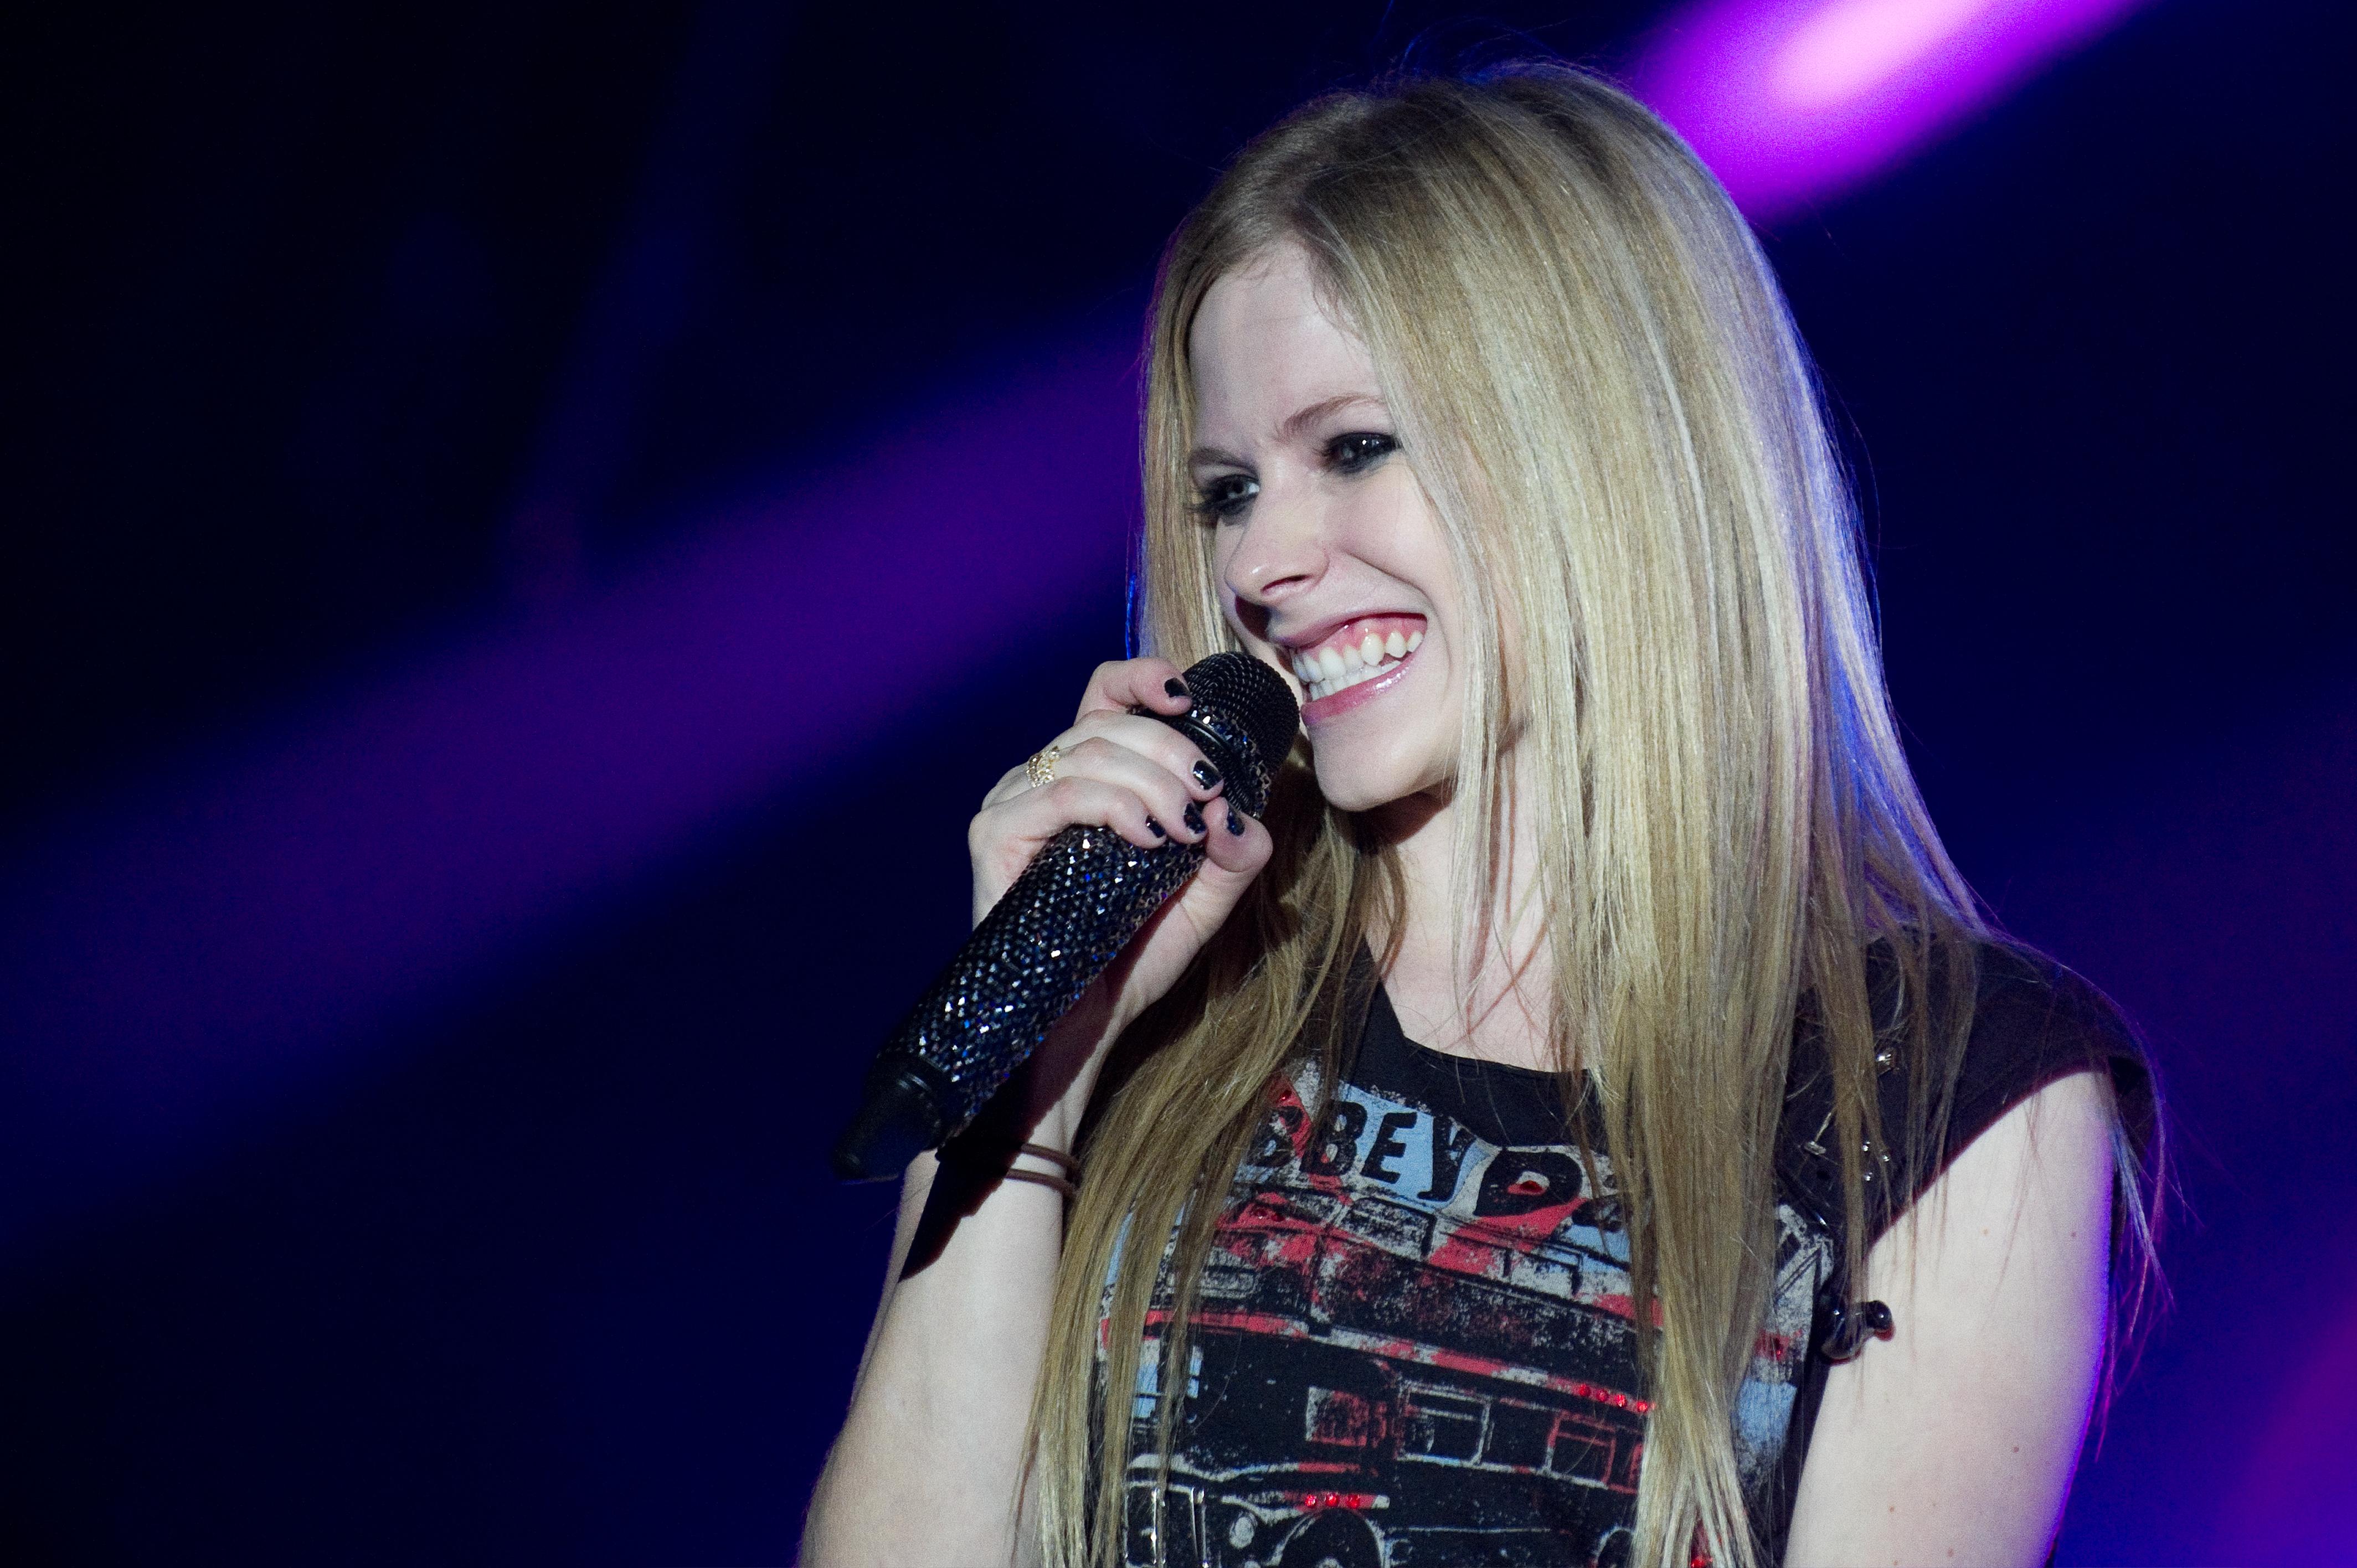 Avril Lavigne Starts Social Media Beef With Mark Zuckerberg To Defend Nickelback